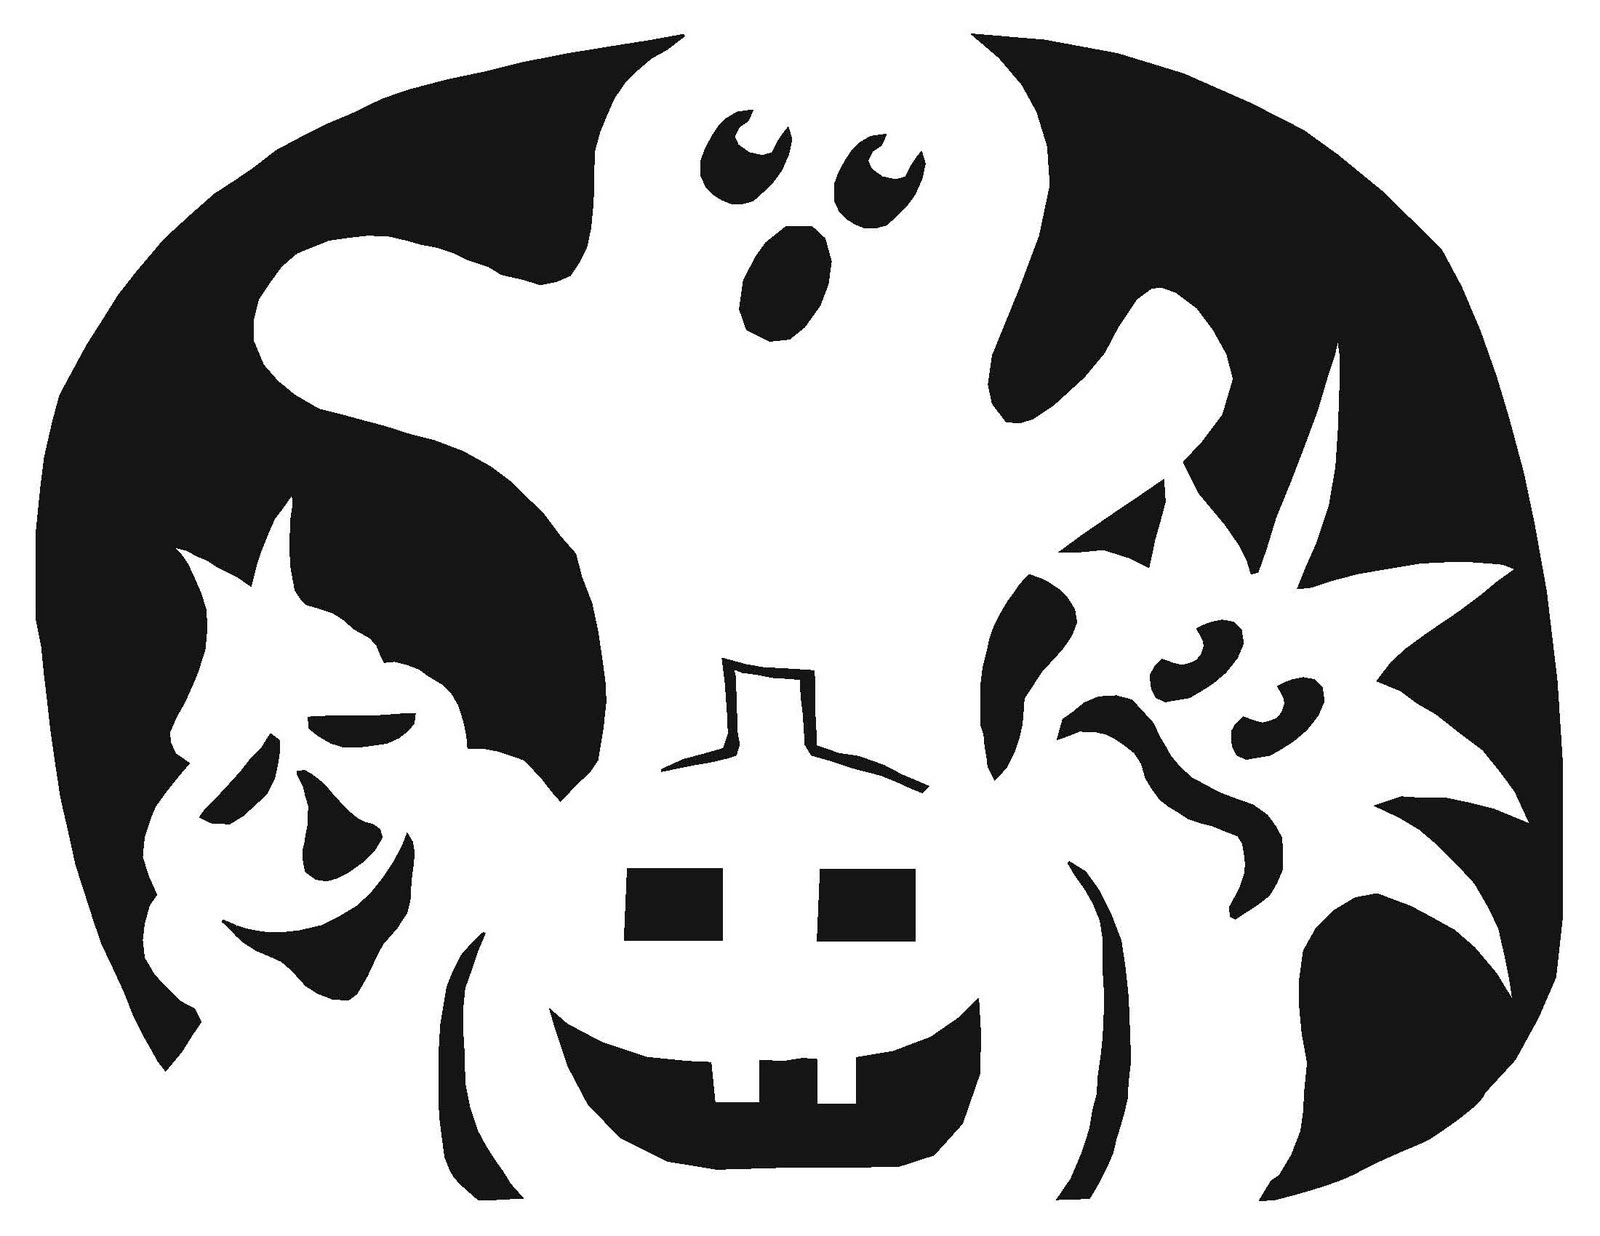 Free Guitar Pumpkin Stencil, Download Free Clip Art, Free Clip Art - Pumpkin Patterns Free Printable